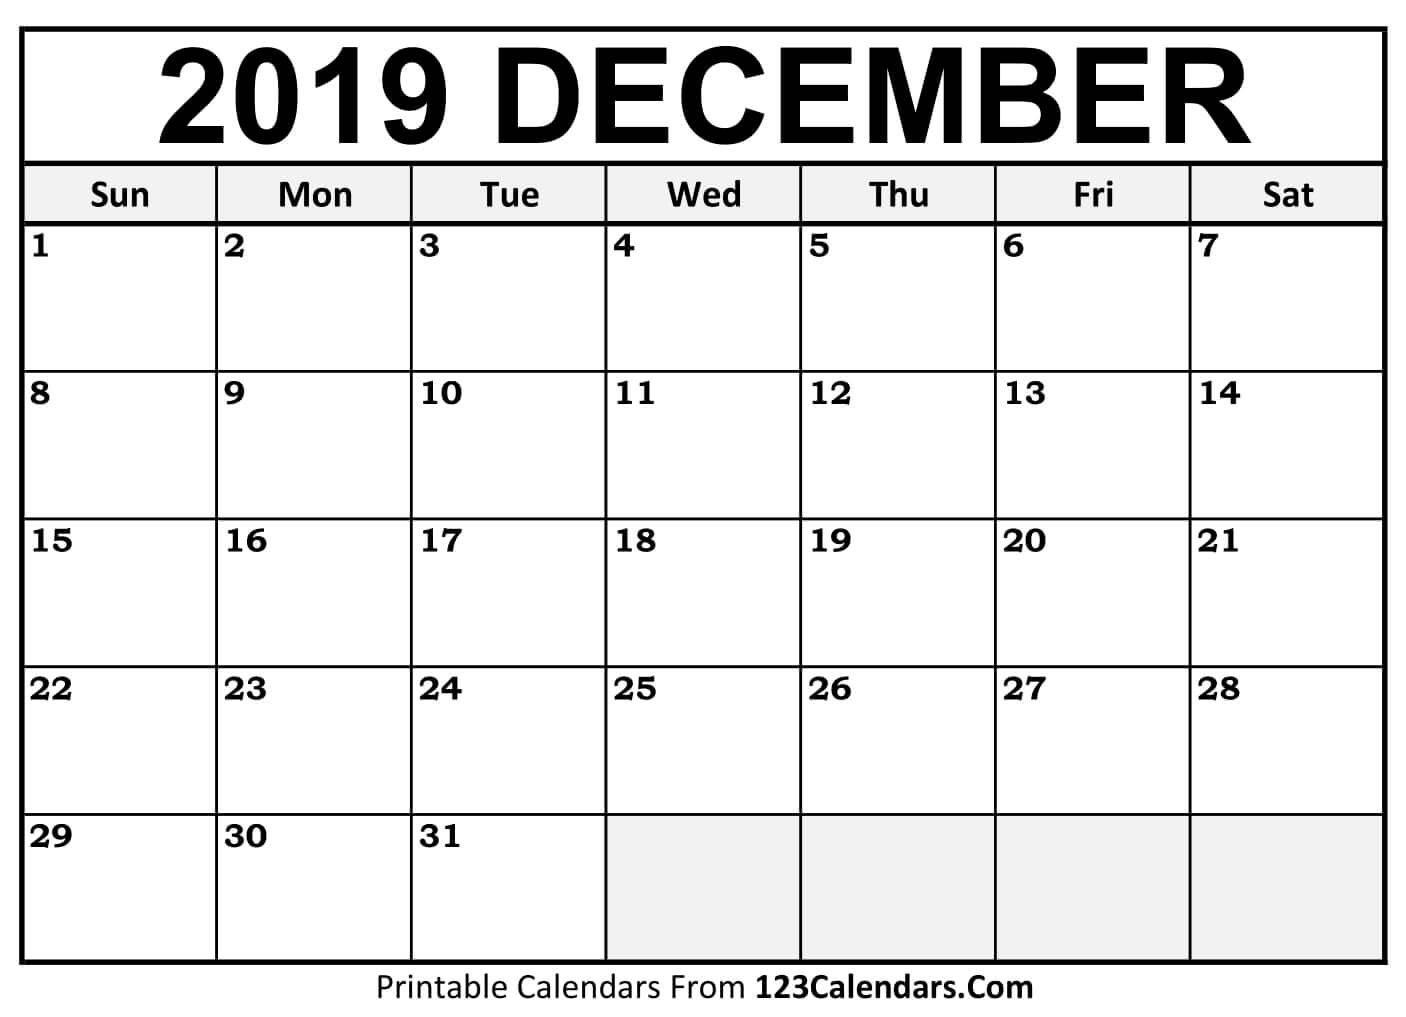 Printable December 2019 Calendar Templates – 123Calendars Calendar 2019 December